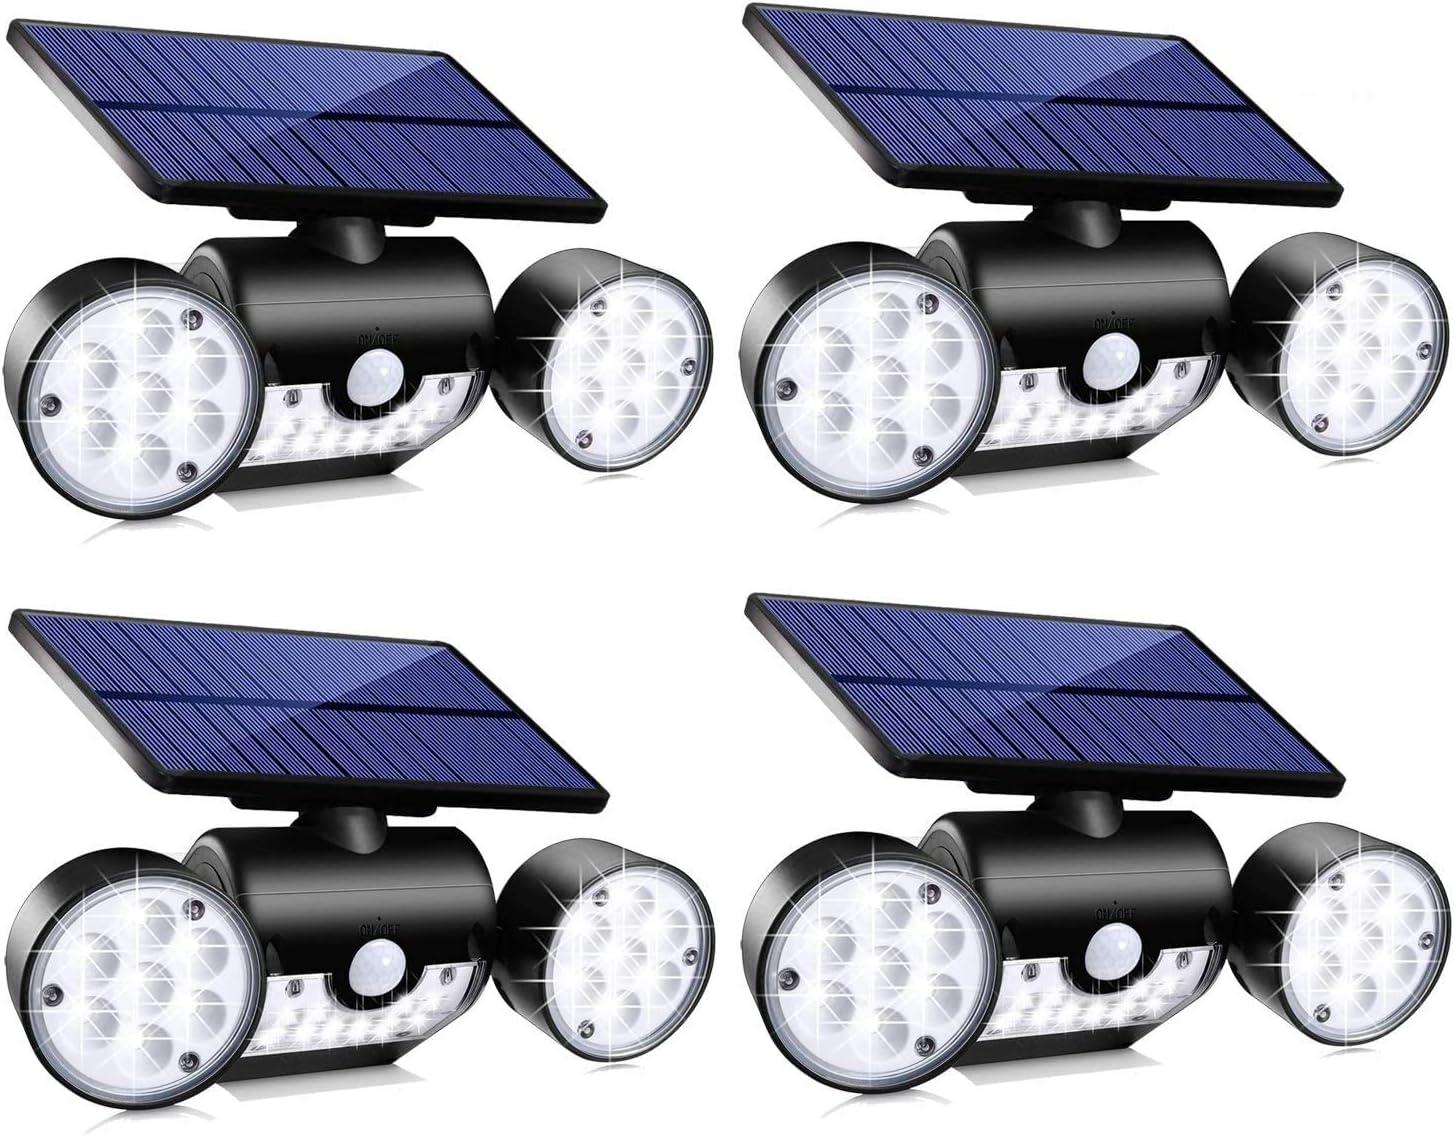 Topmante Solar Motion Sensor Lights